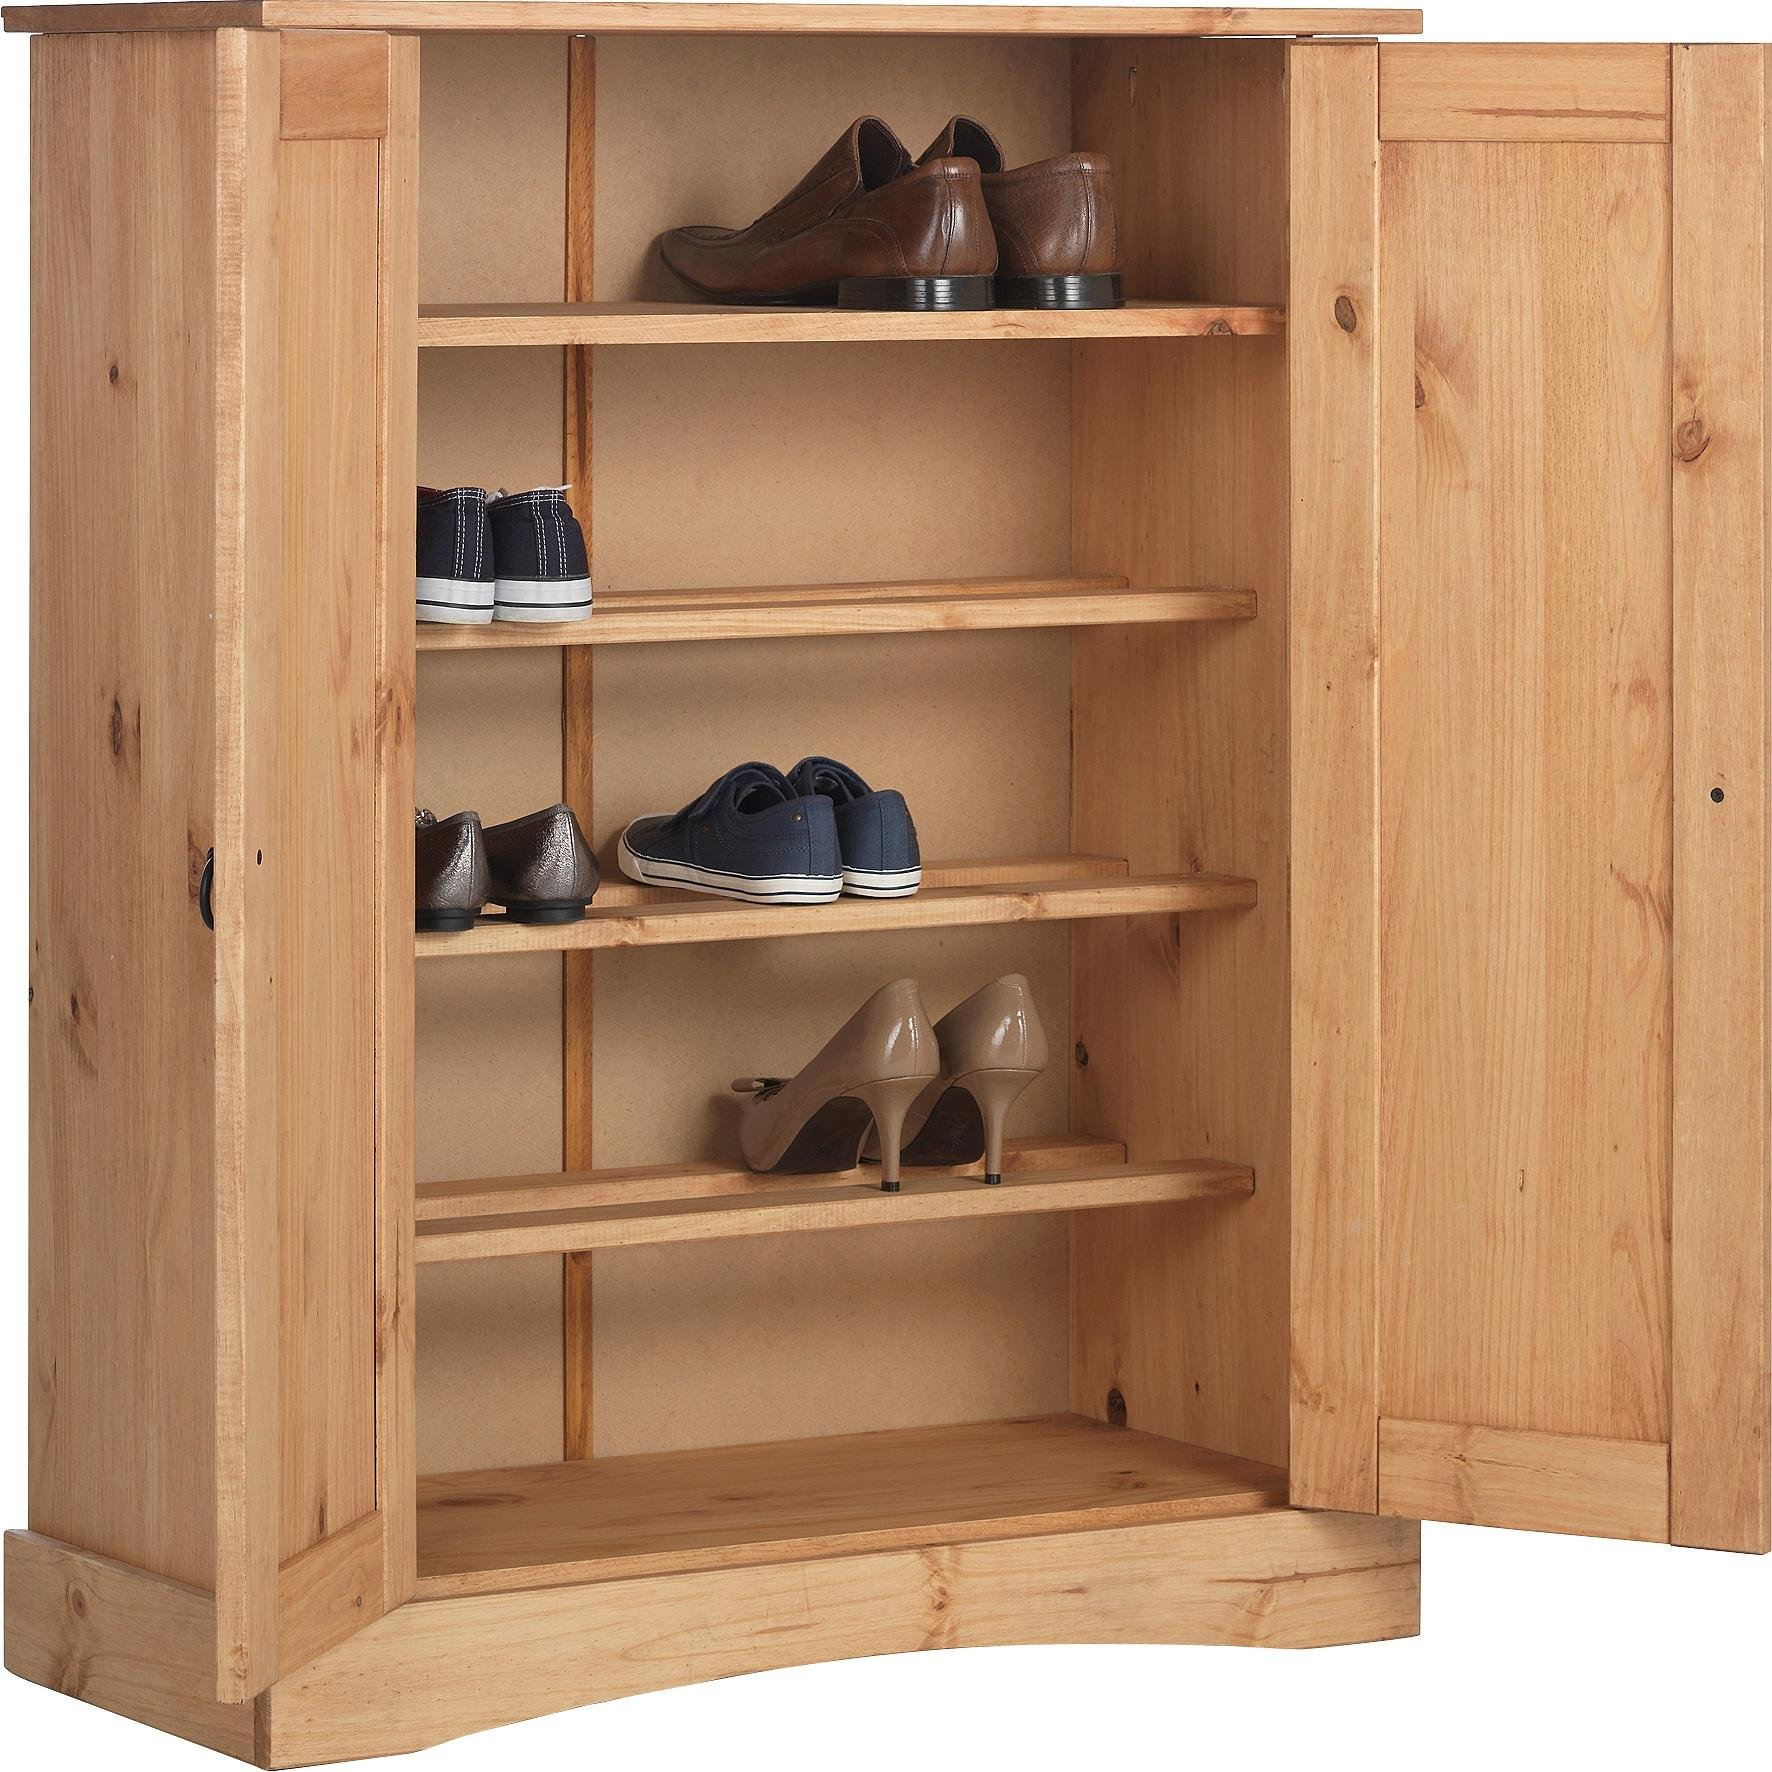 Argos Home Puerto Rico Shoe Storage Cabinet   Antique Pine904/2478